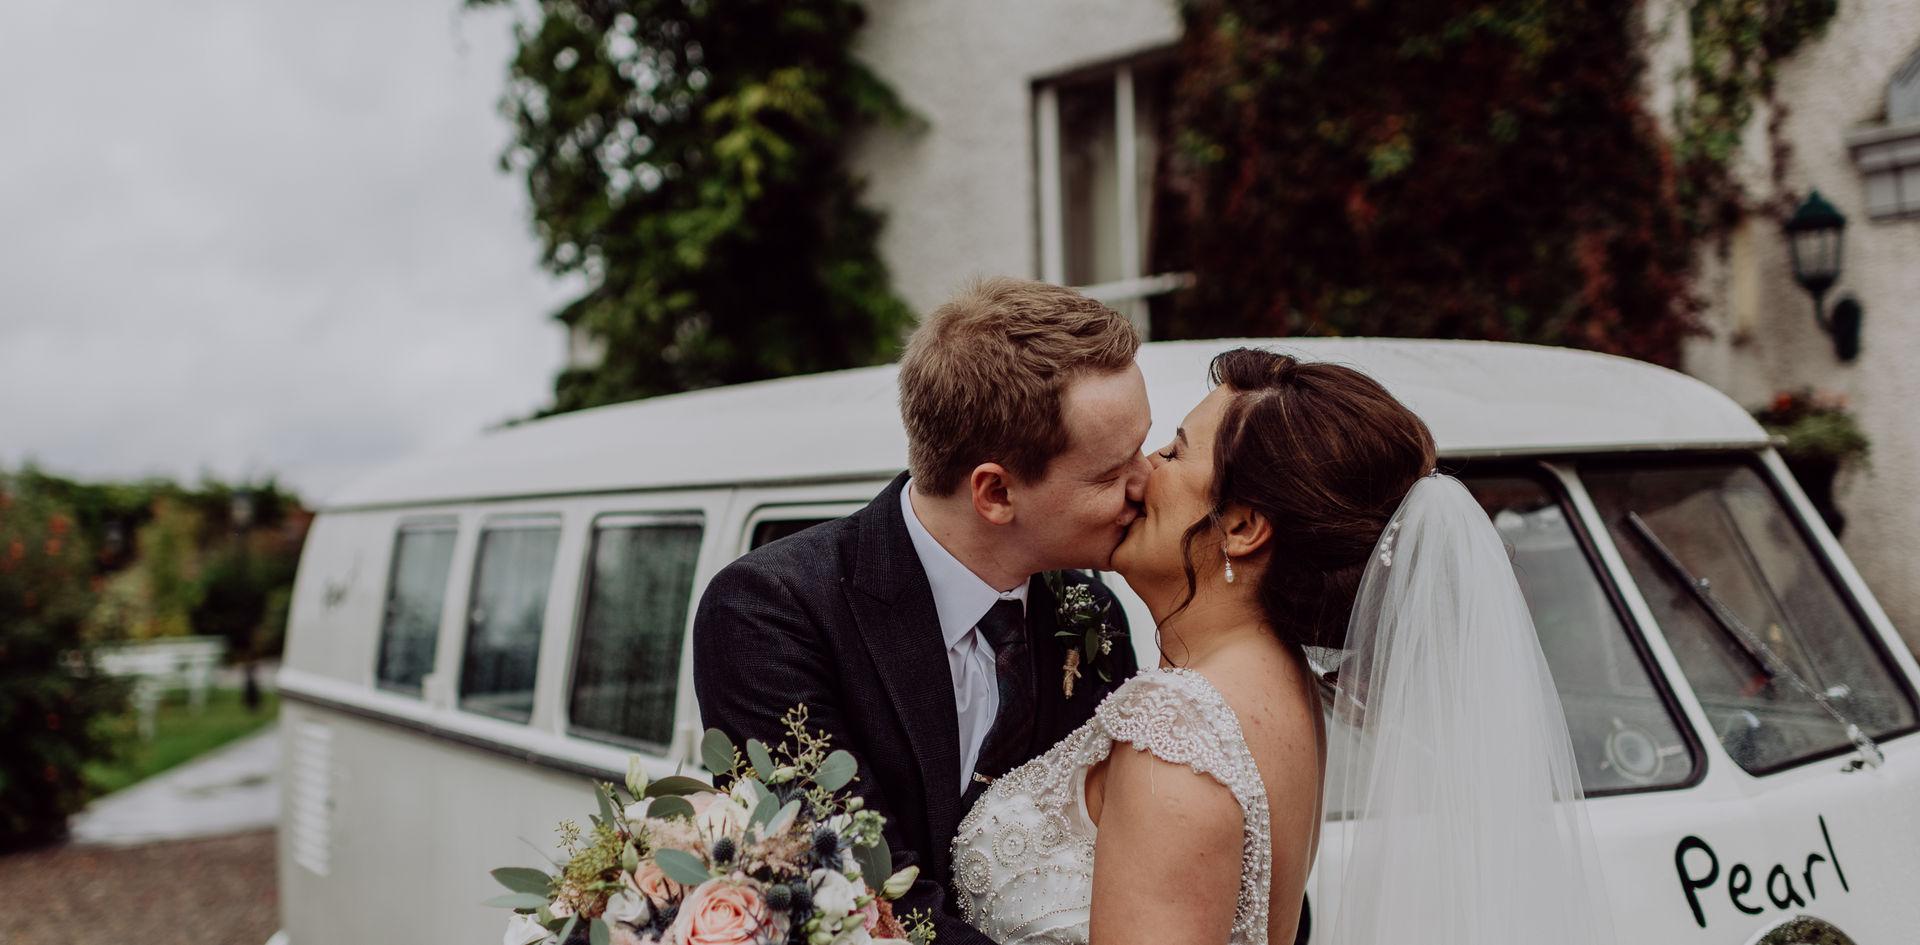 corick-house-hotel-wedding-moore-257.JPG